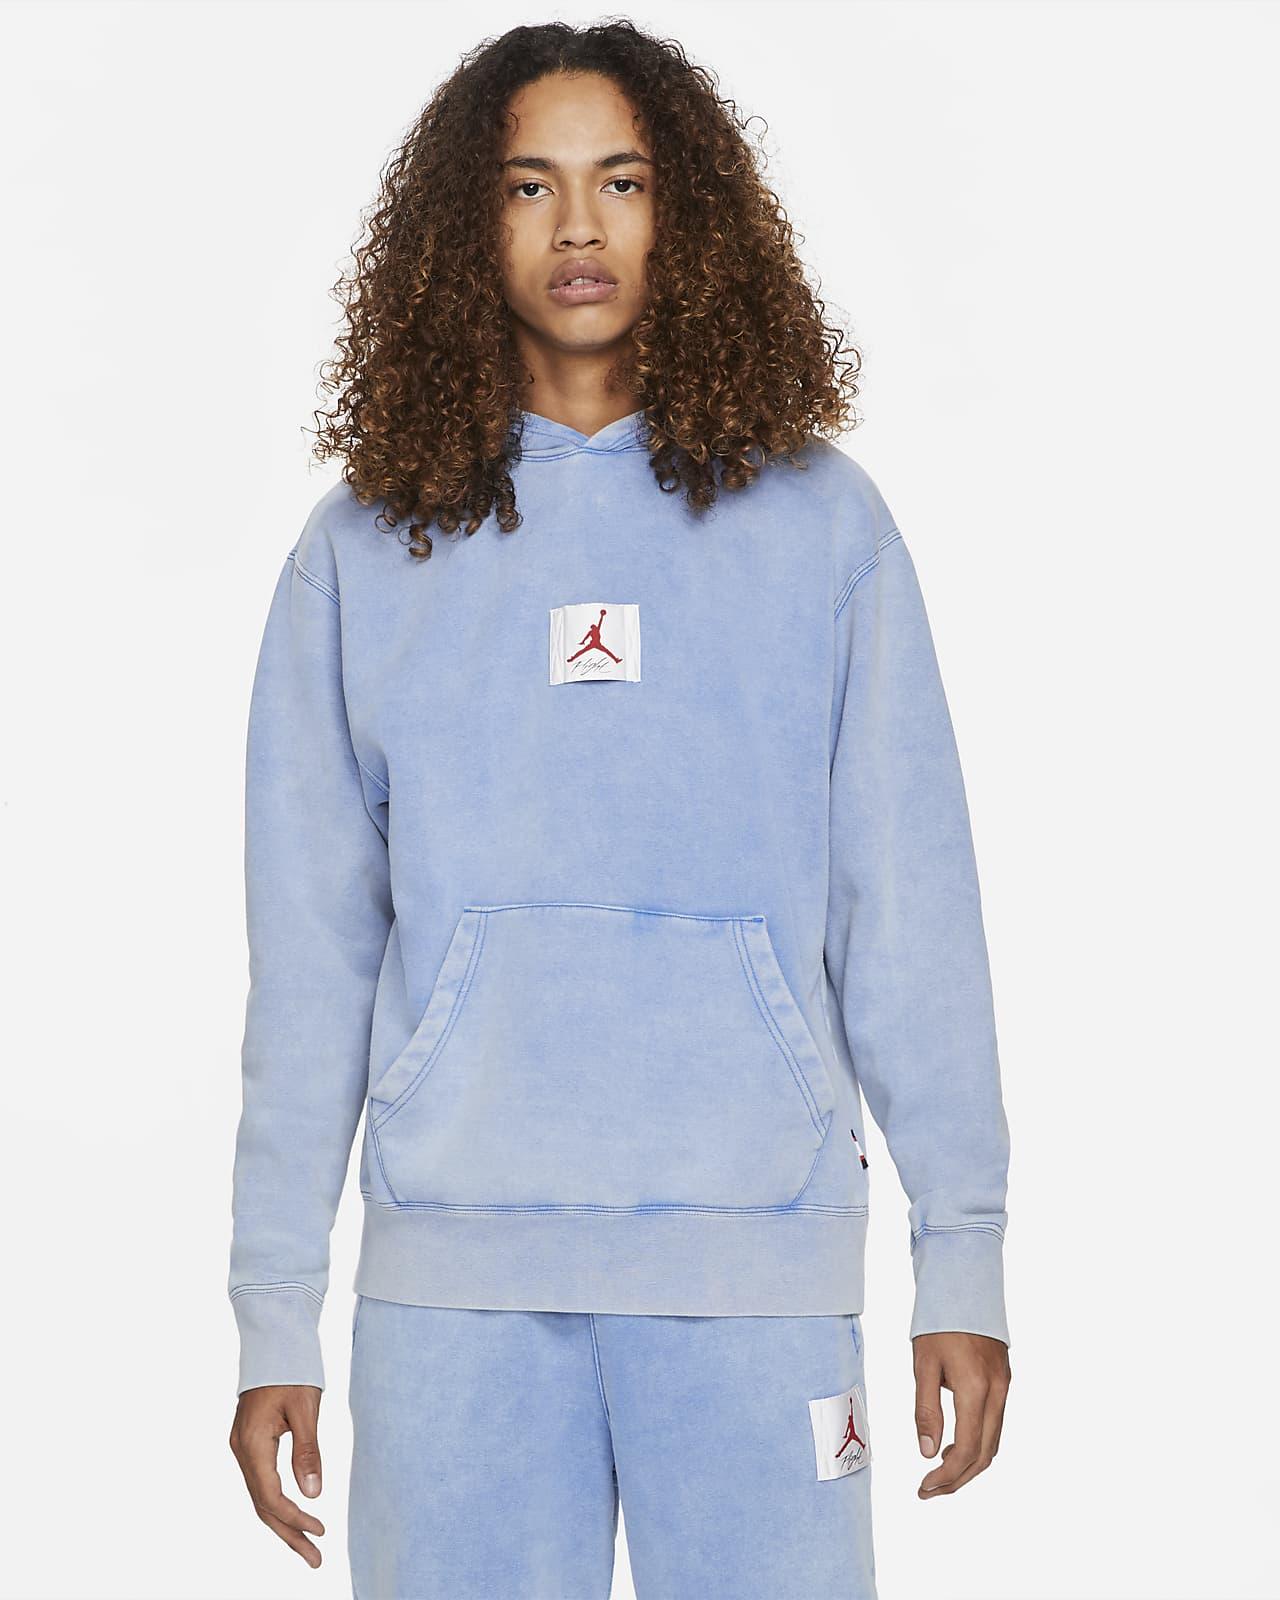 Felpa pullover con cappuccio e grafica Jordan Flight Fleece - Uomo